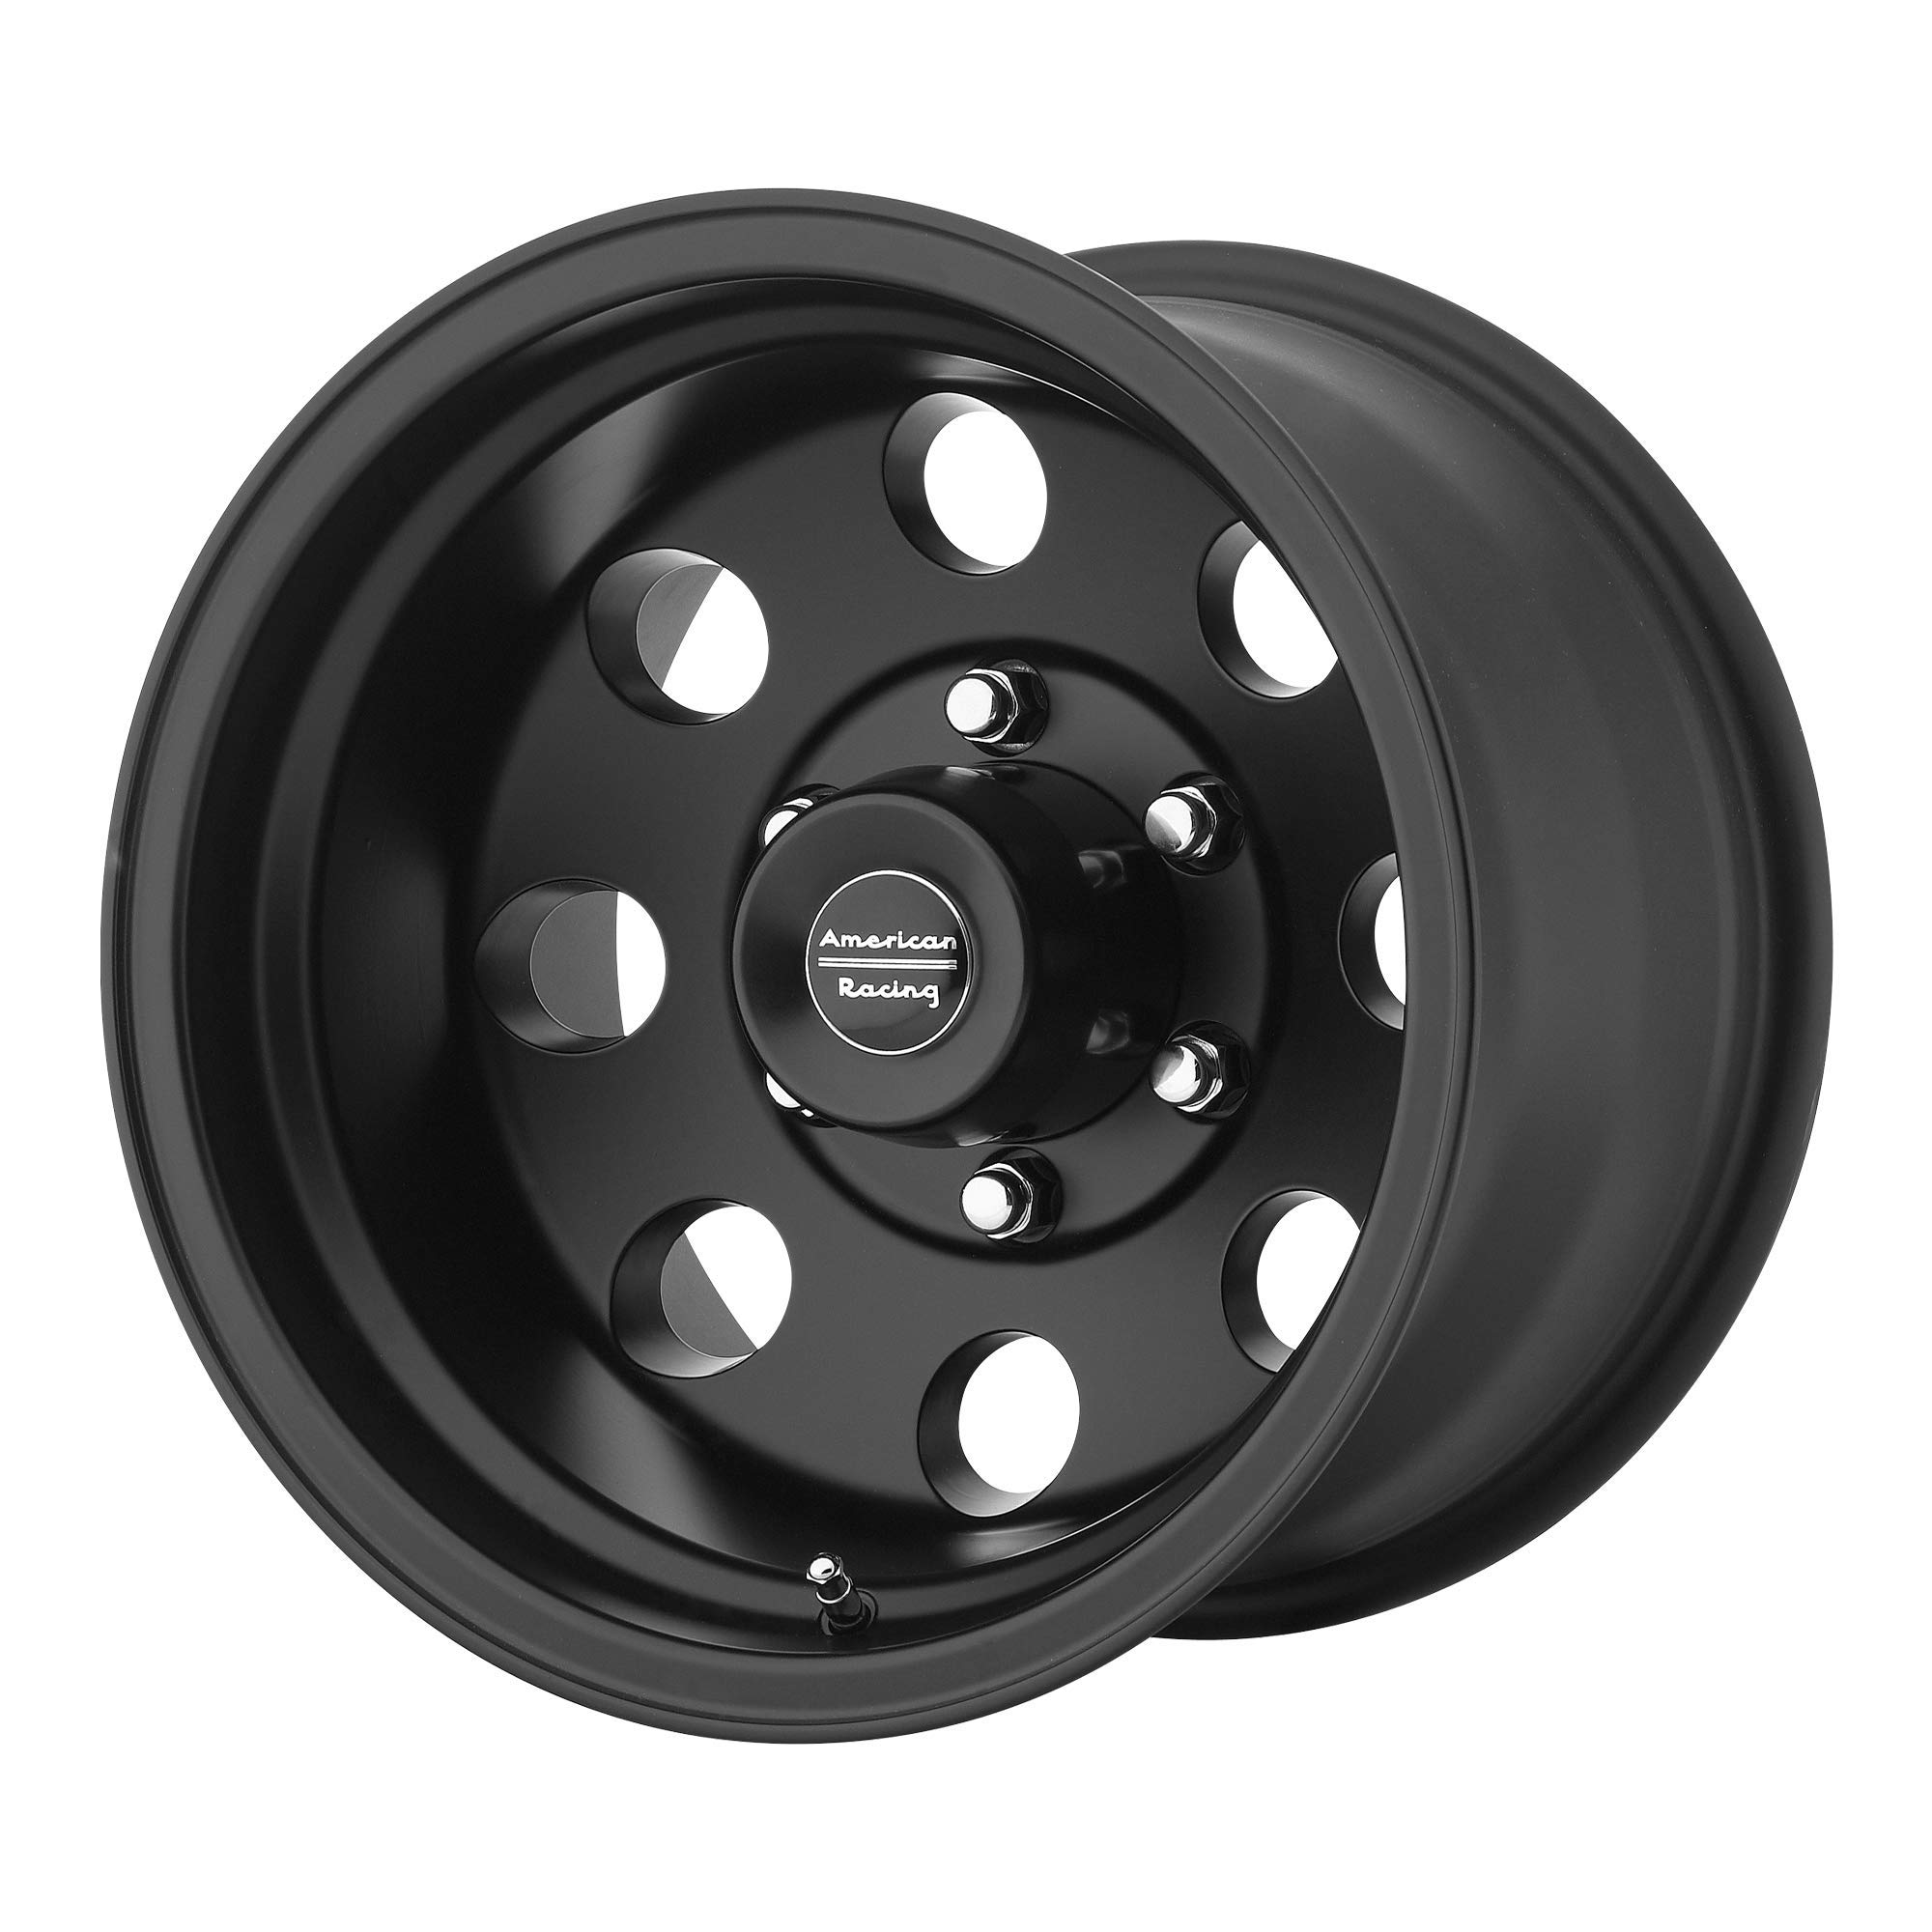 AMERICAN RACING BAJA SATIN BLACK BAJA 15x7 5x120.65 SATIN BLACK (-6 mm) Wheel Tire